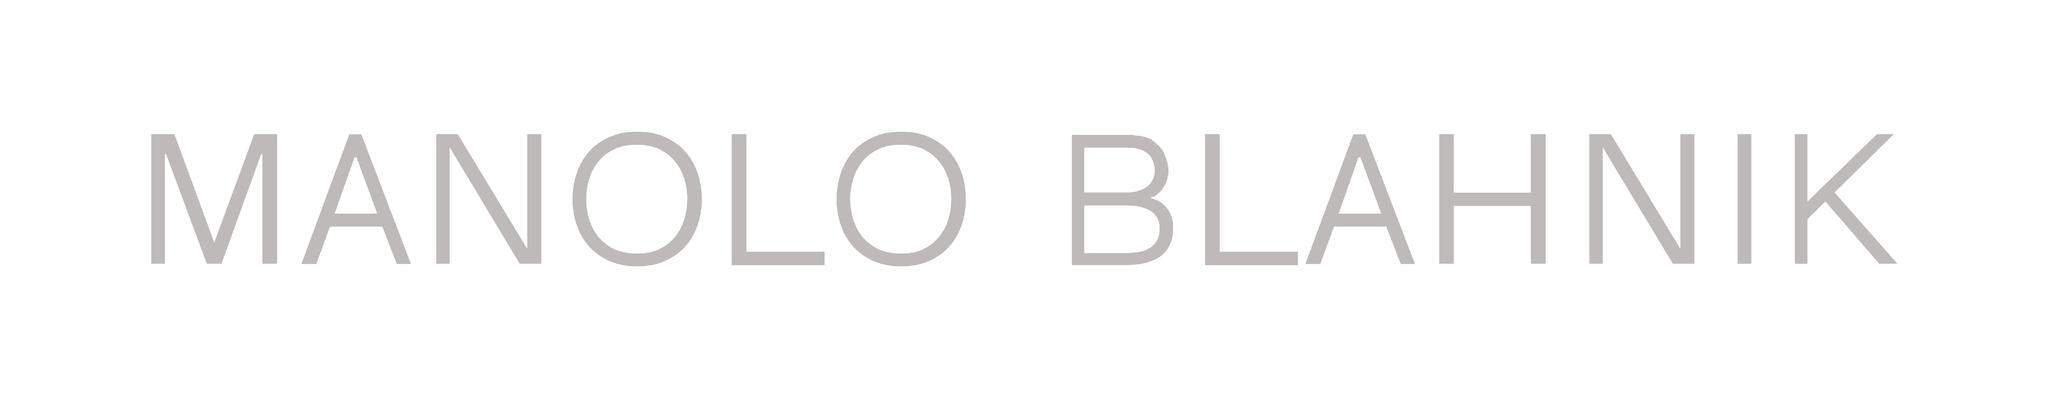 Manolo-Blahnik---Logo-Cool-Grey-4C-hq-JPEG-HIGH-RES.jpg.png